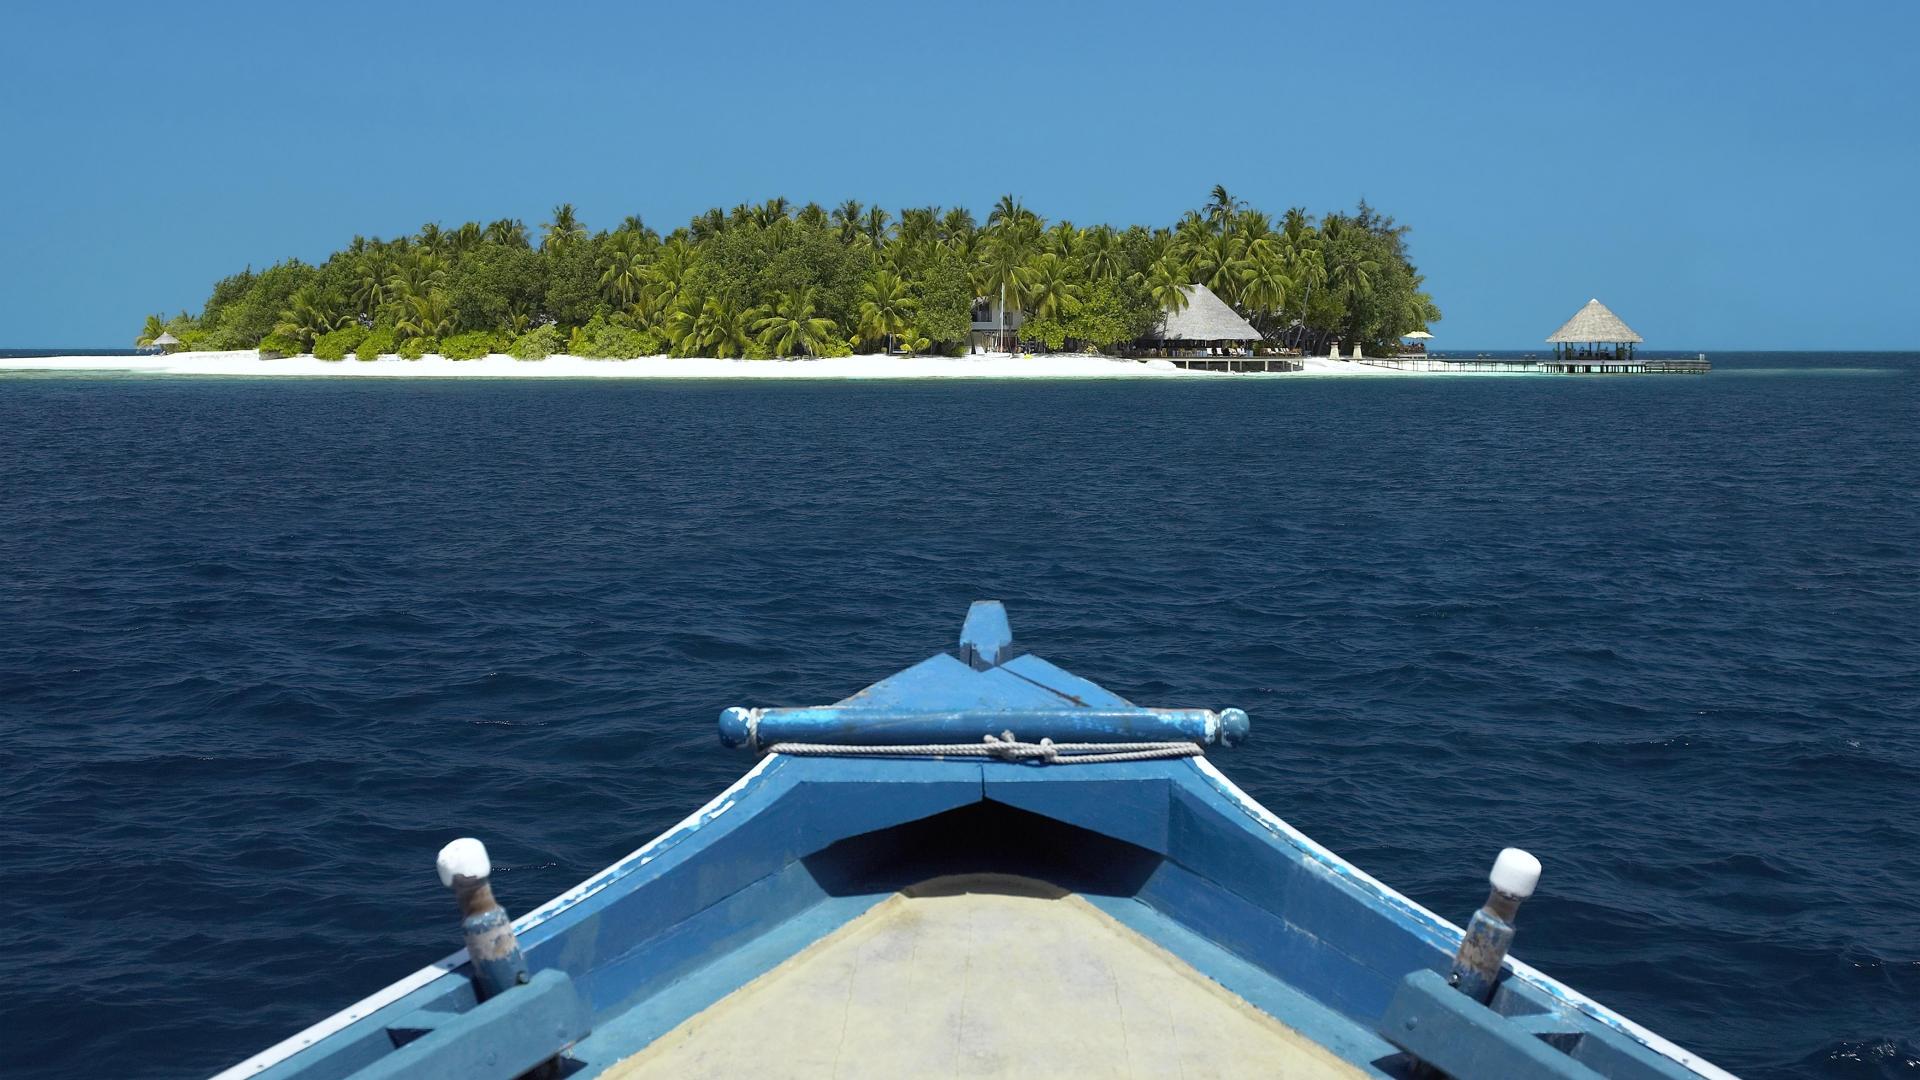 Wallpaper Boat Sea Bay Sky Vehicle Coast Palm Trees